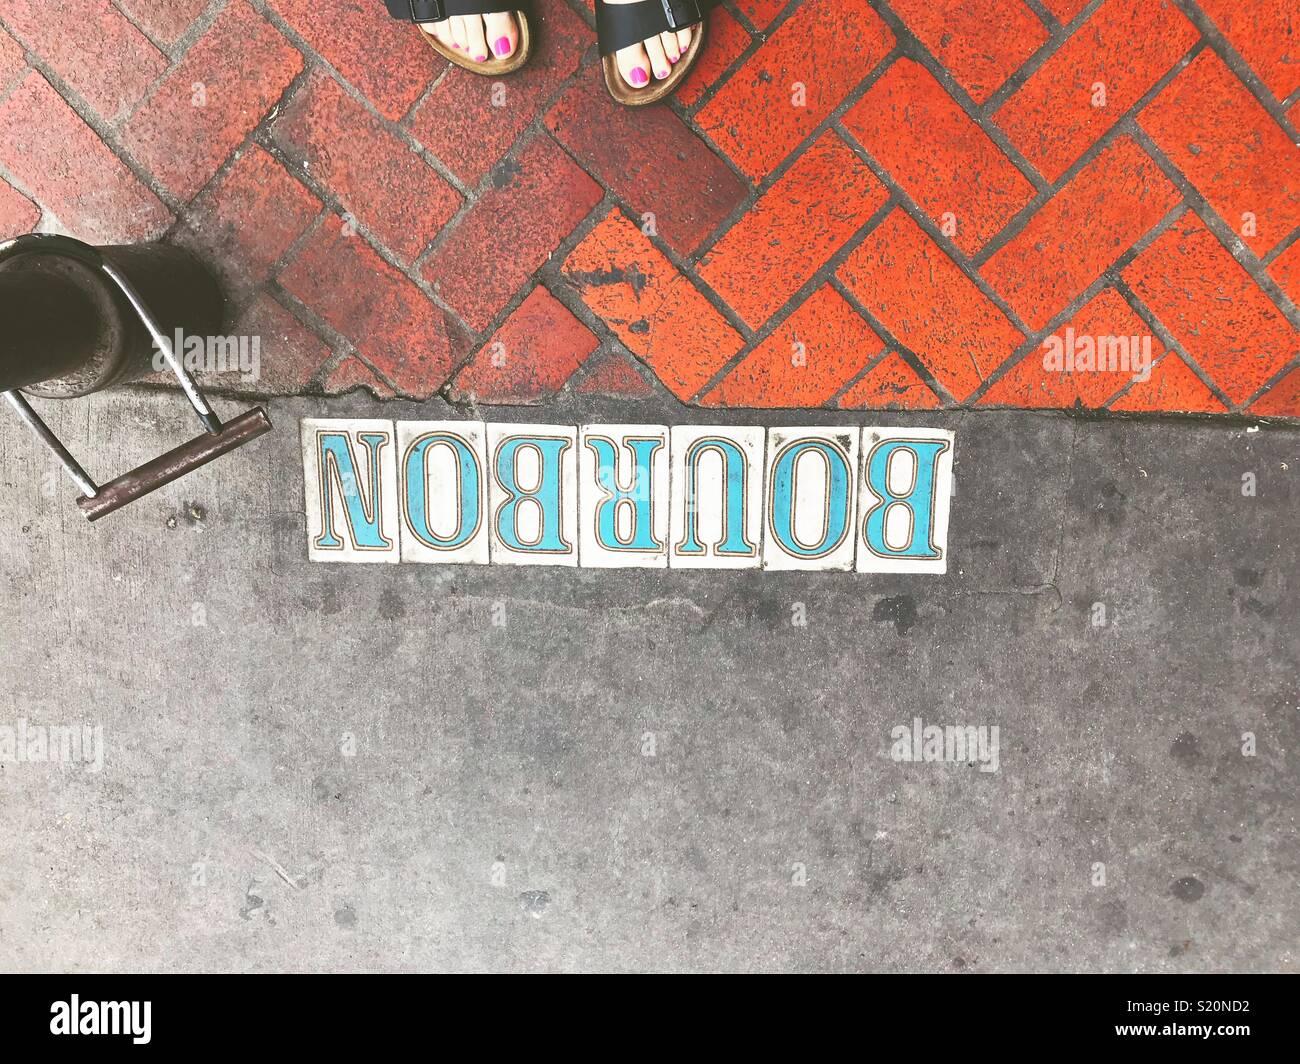 Bourbon St, New Orleans - Stock Image